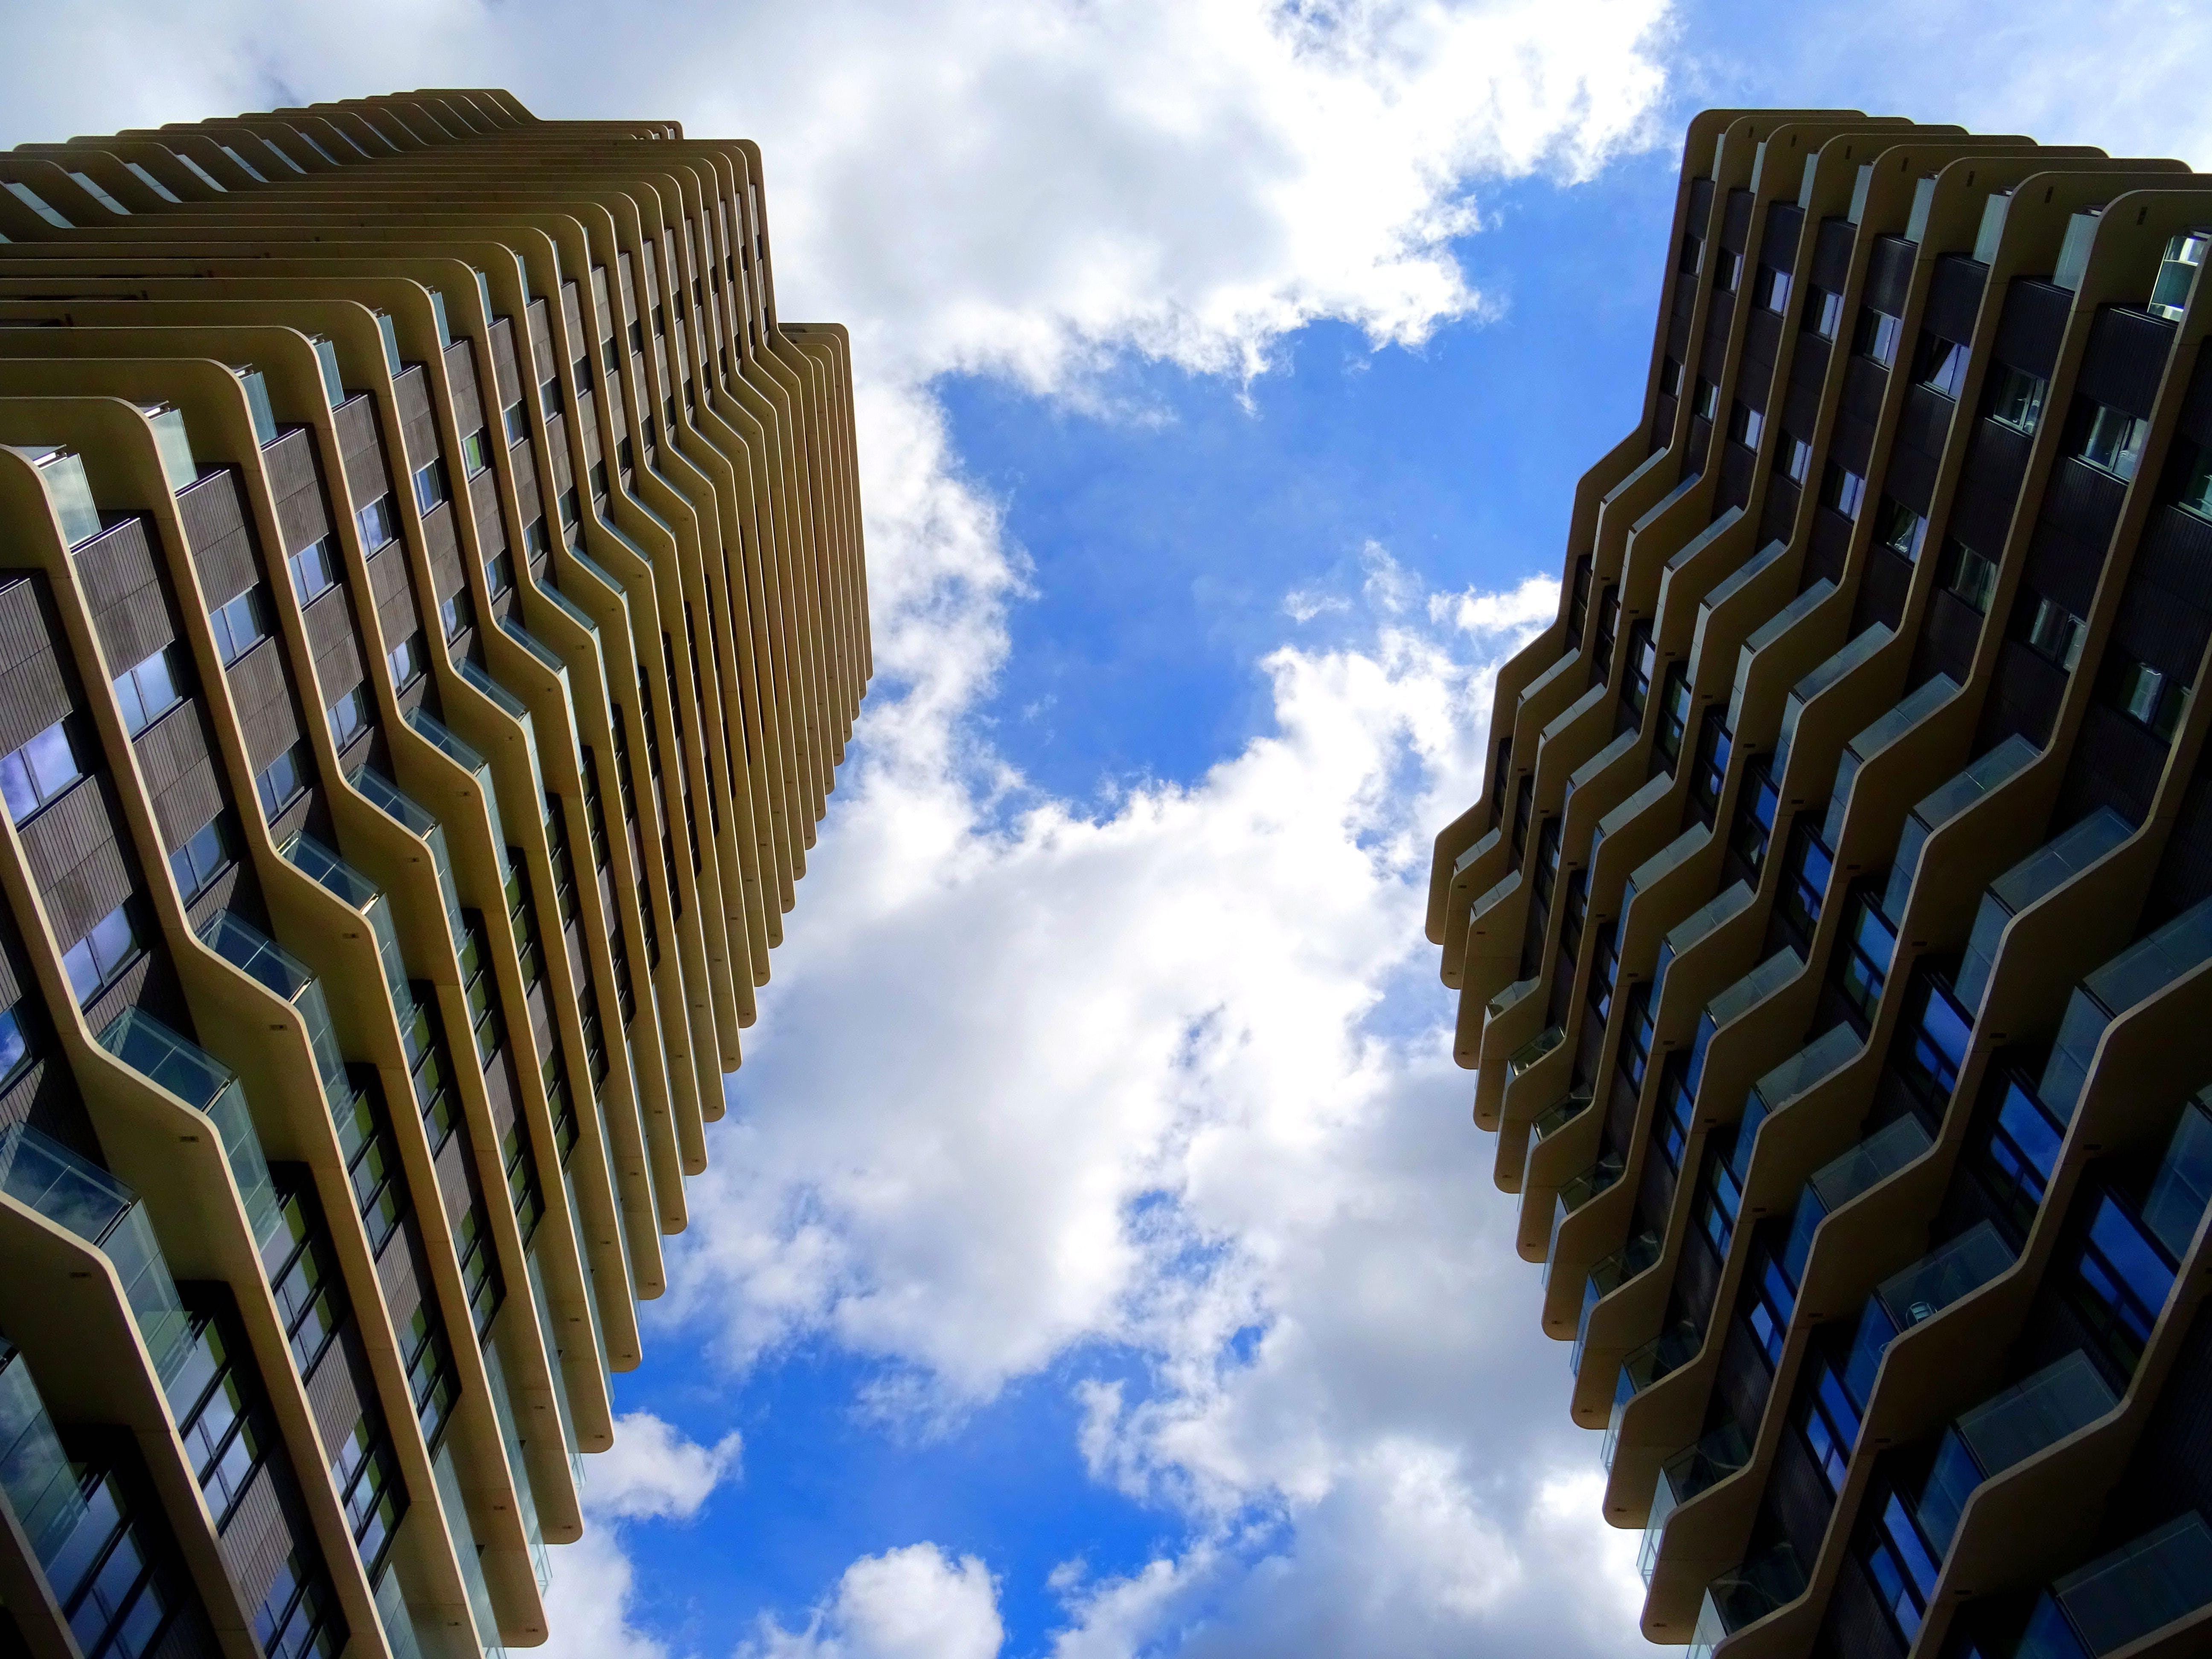 Foto d'estoc gratuïta de acer, arquitectura, cel blau, contemporani